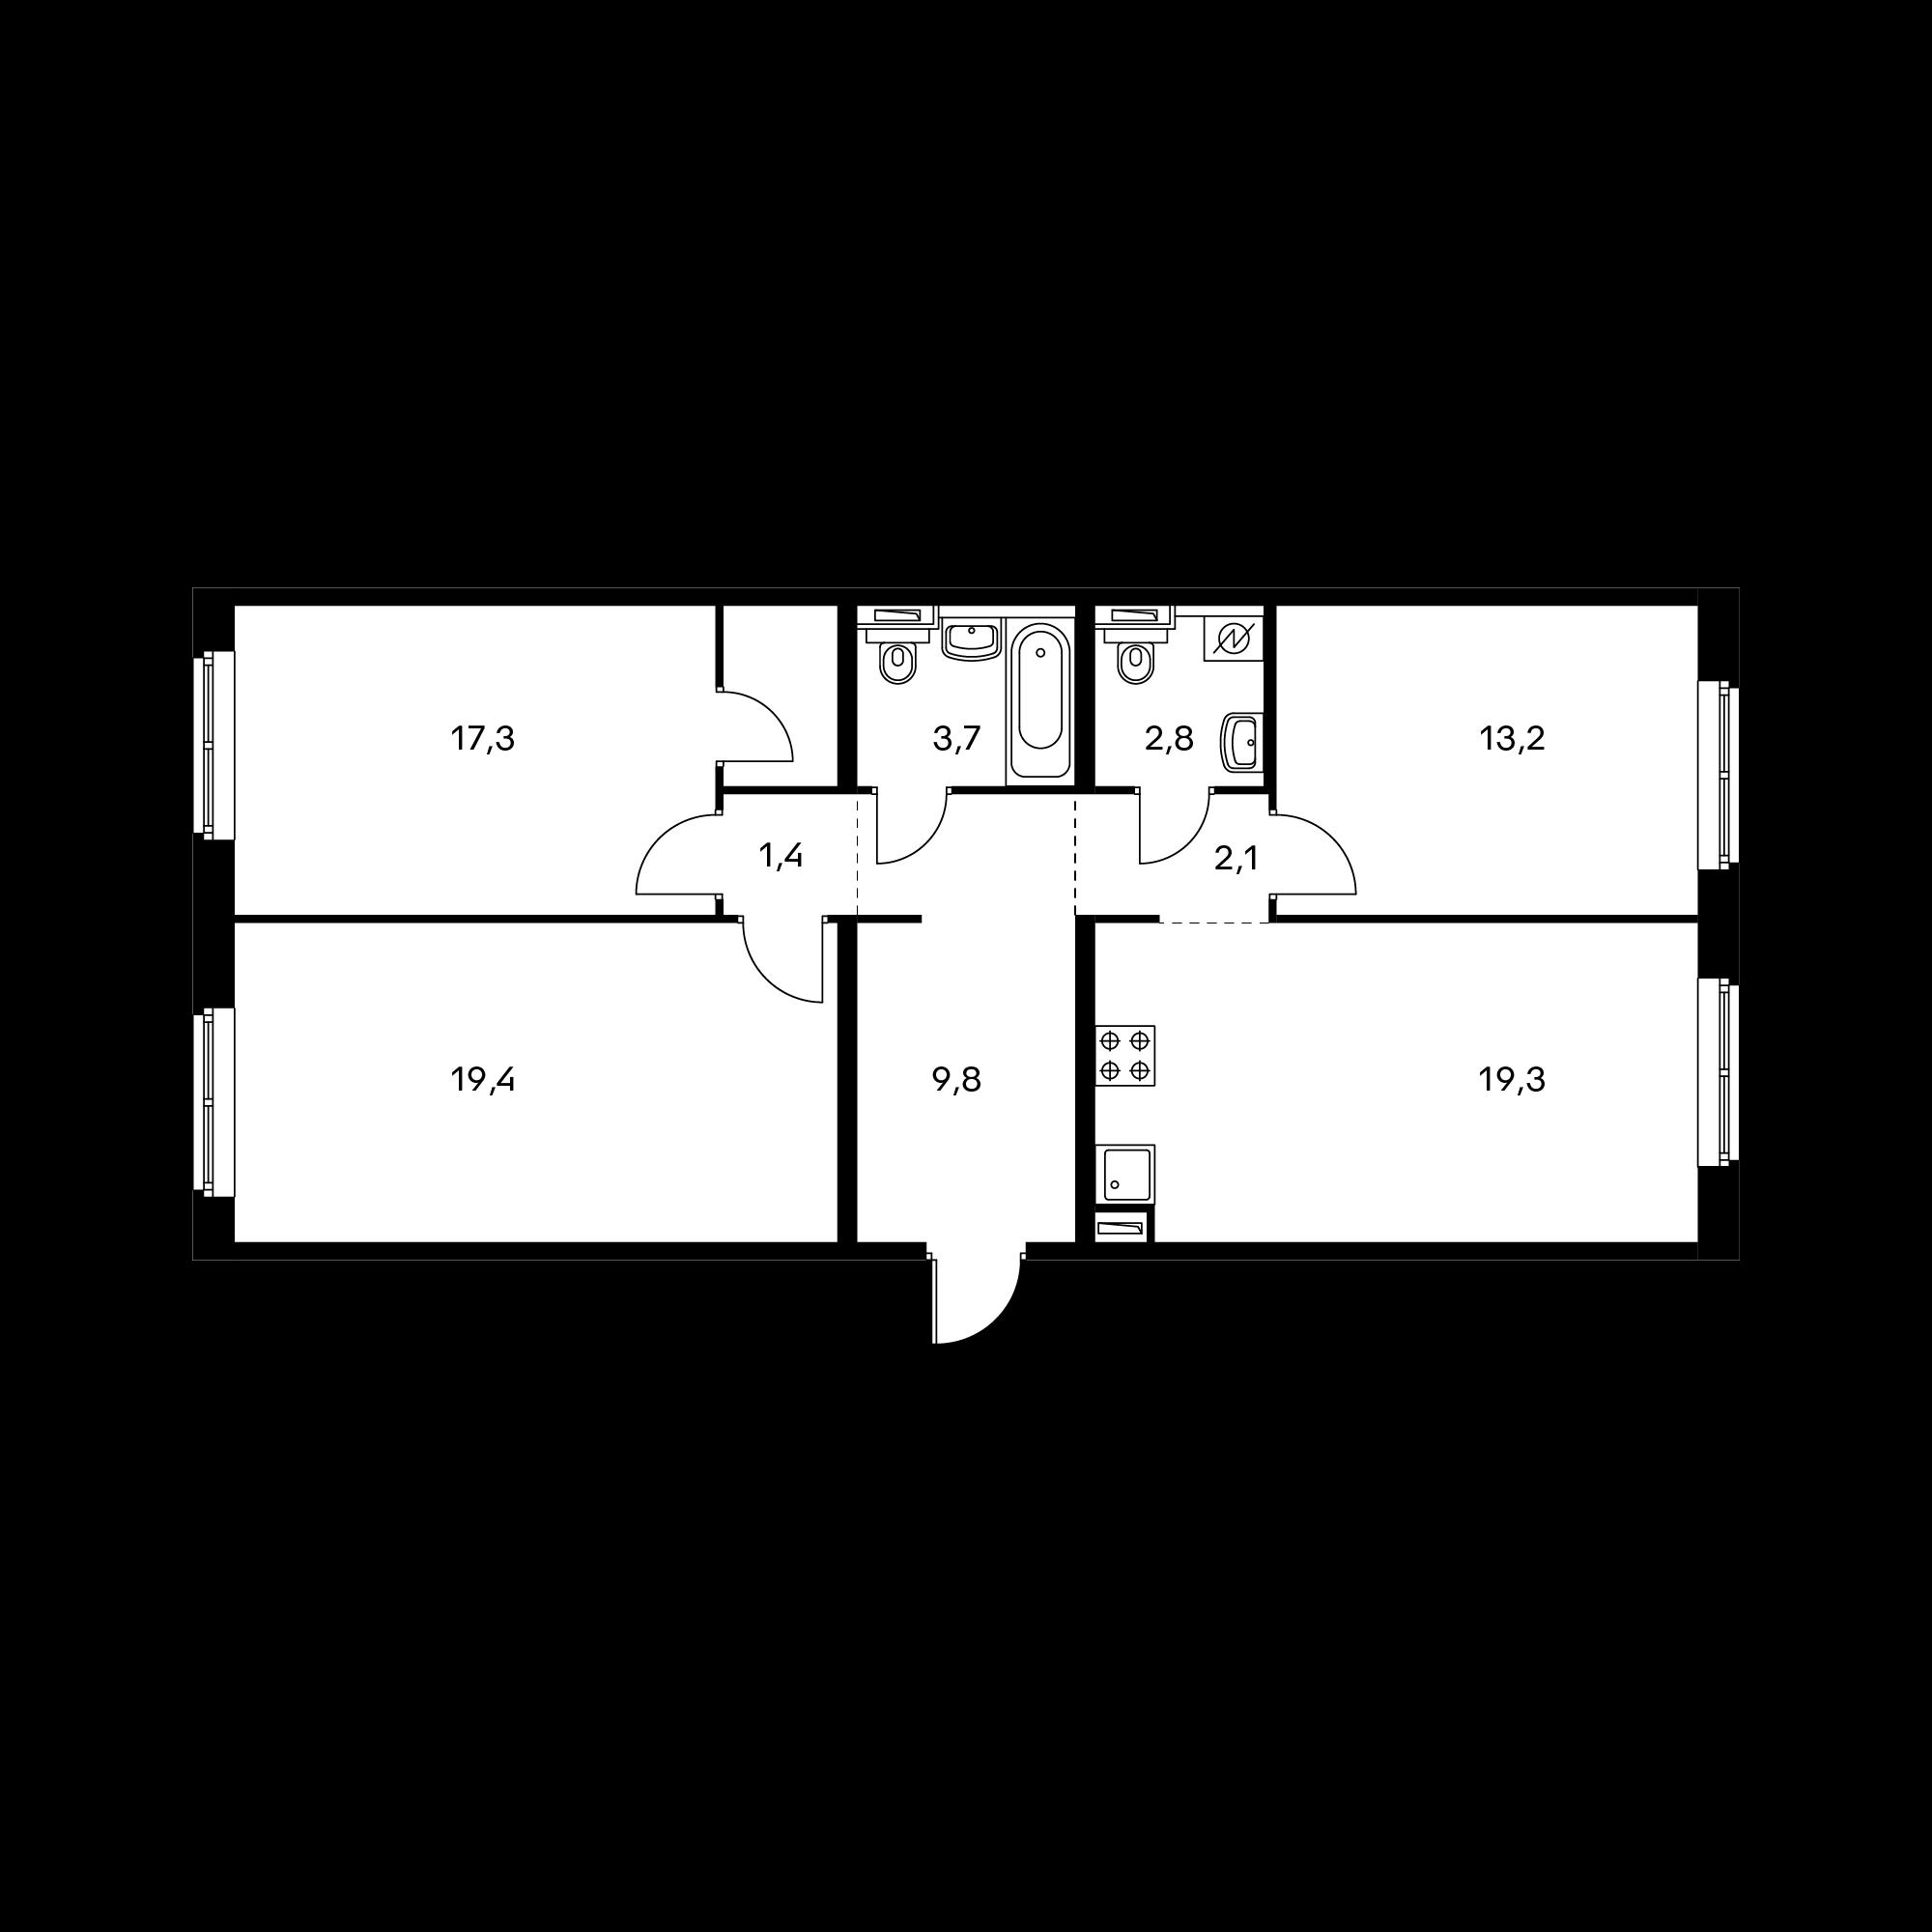 3EL11_6.6-1 (1)